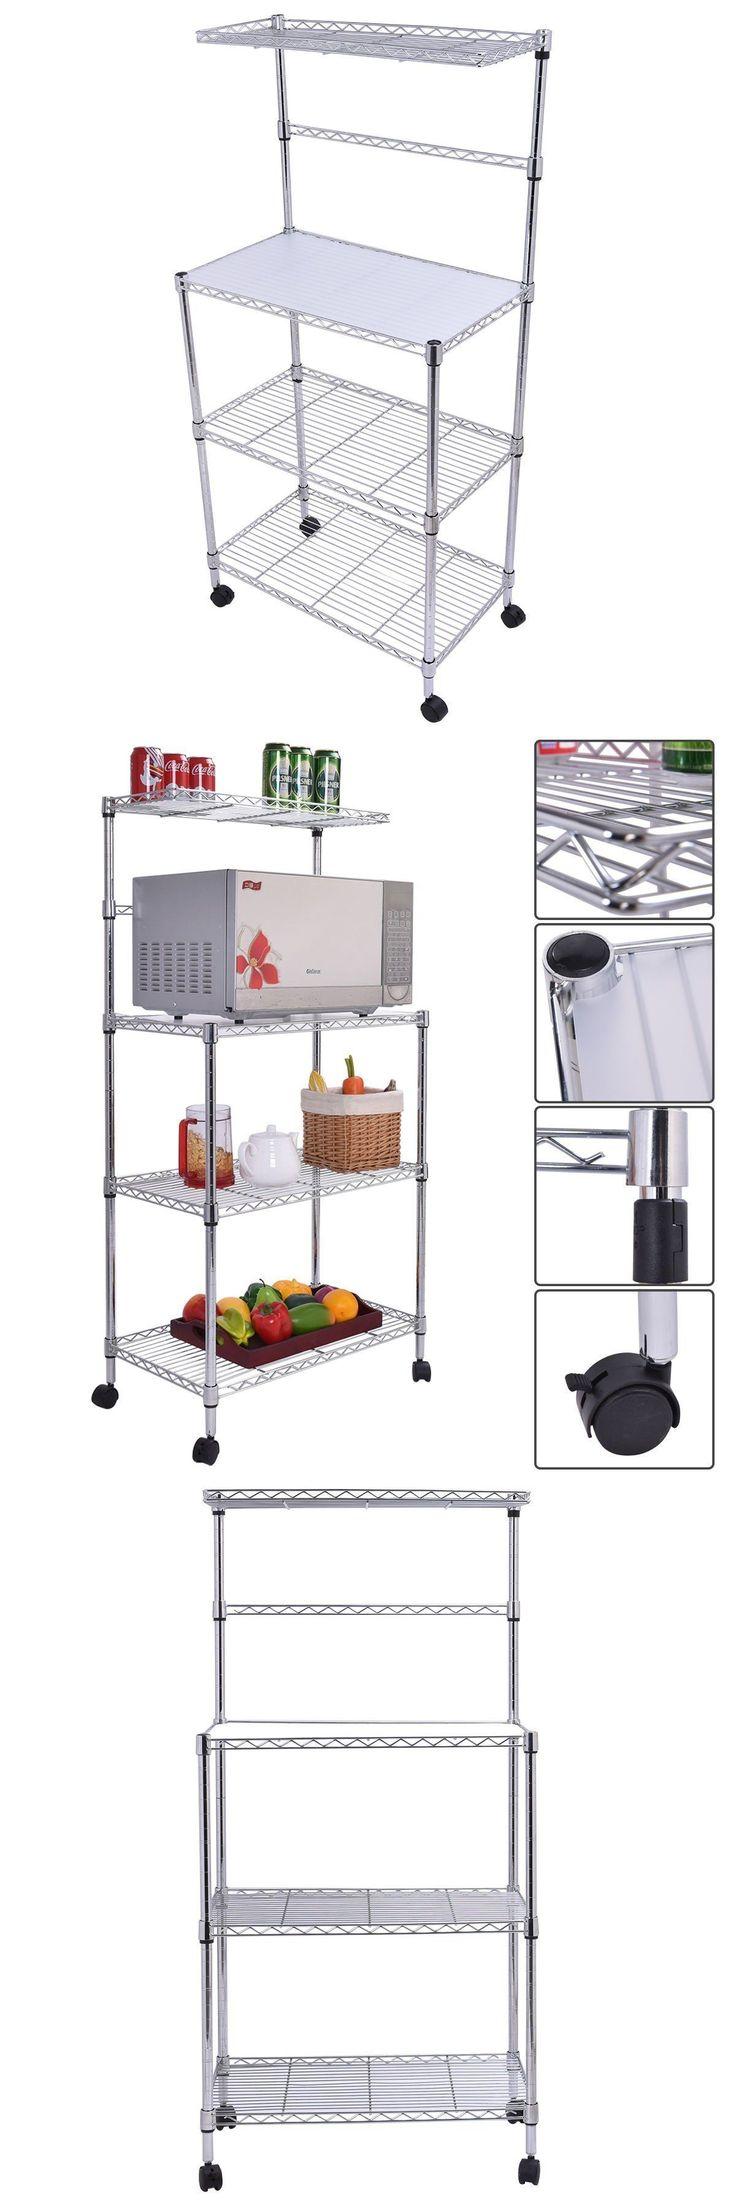 Homegear deluxe kitchen storage cart island w rubberwood cutting block - Bakers Racks 20482 3 Tier Kitchen Baker S Rack Microwave Oven Stand Storage Cart